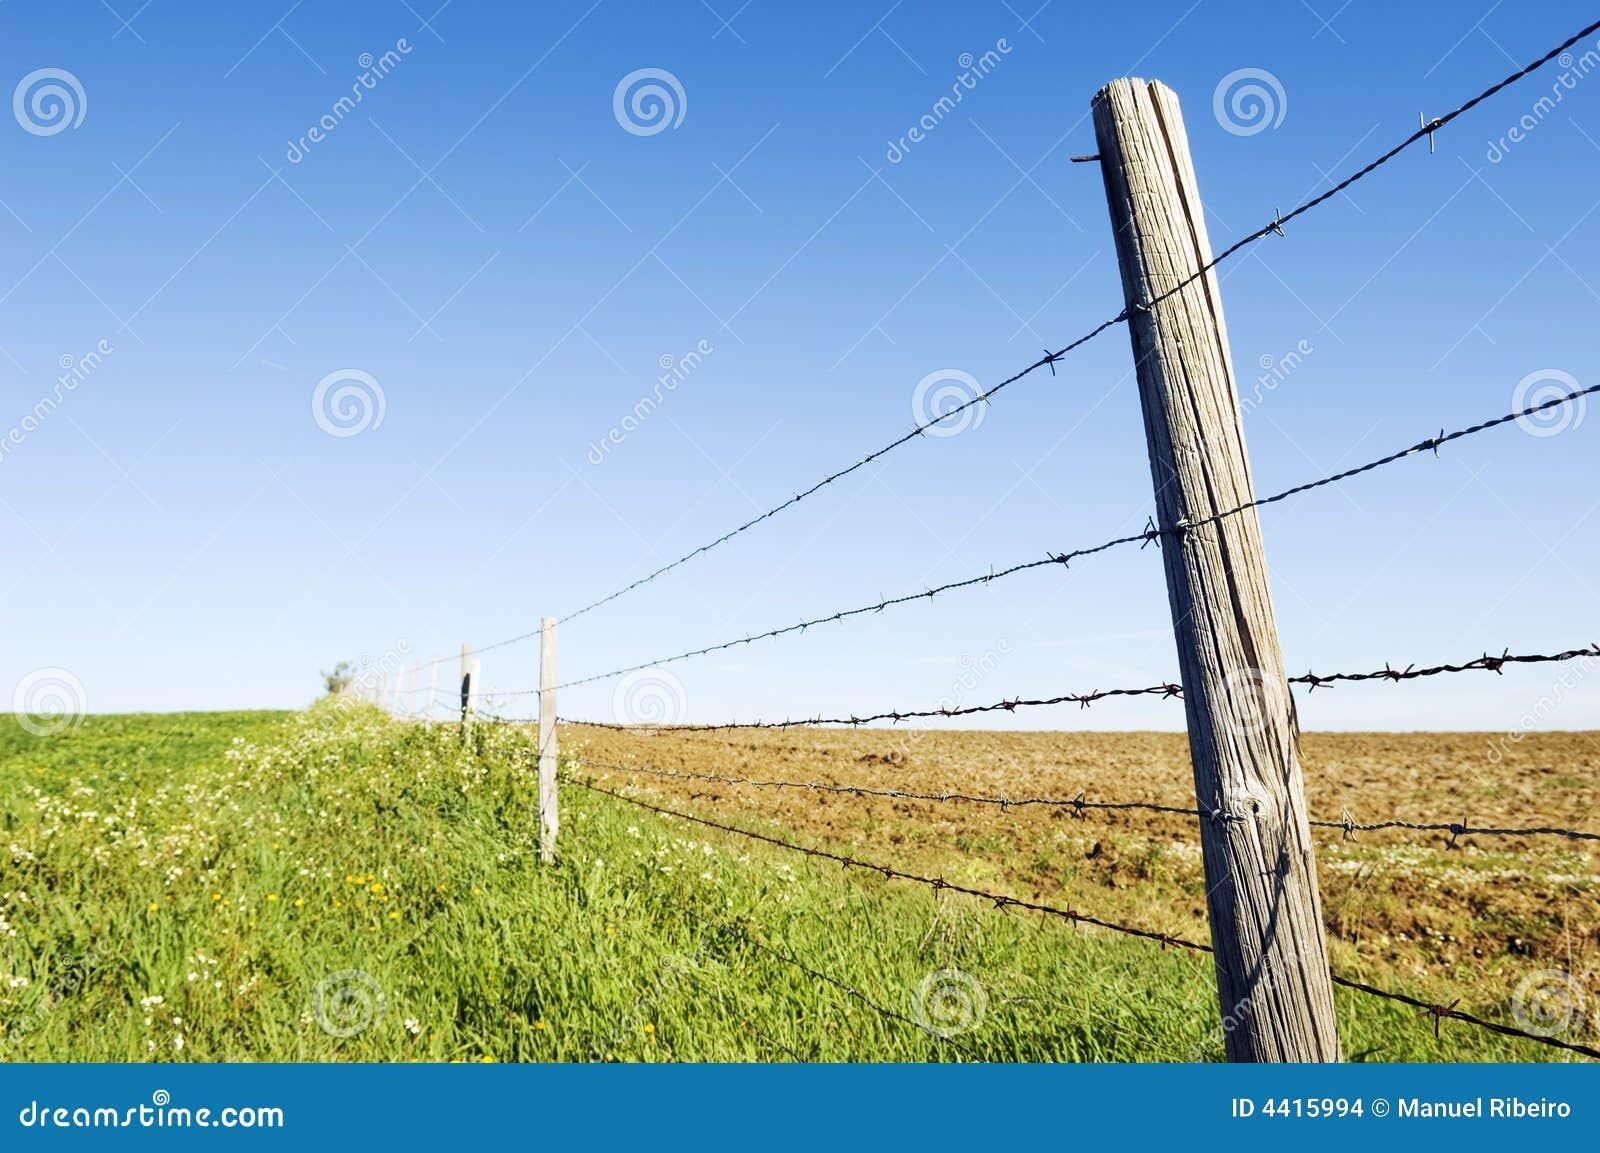 Barbwire fence stock photo. Image of farm, horizon ...